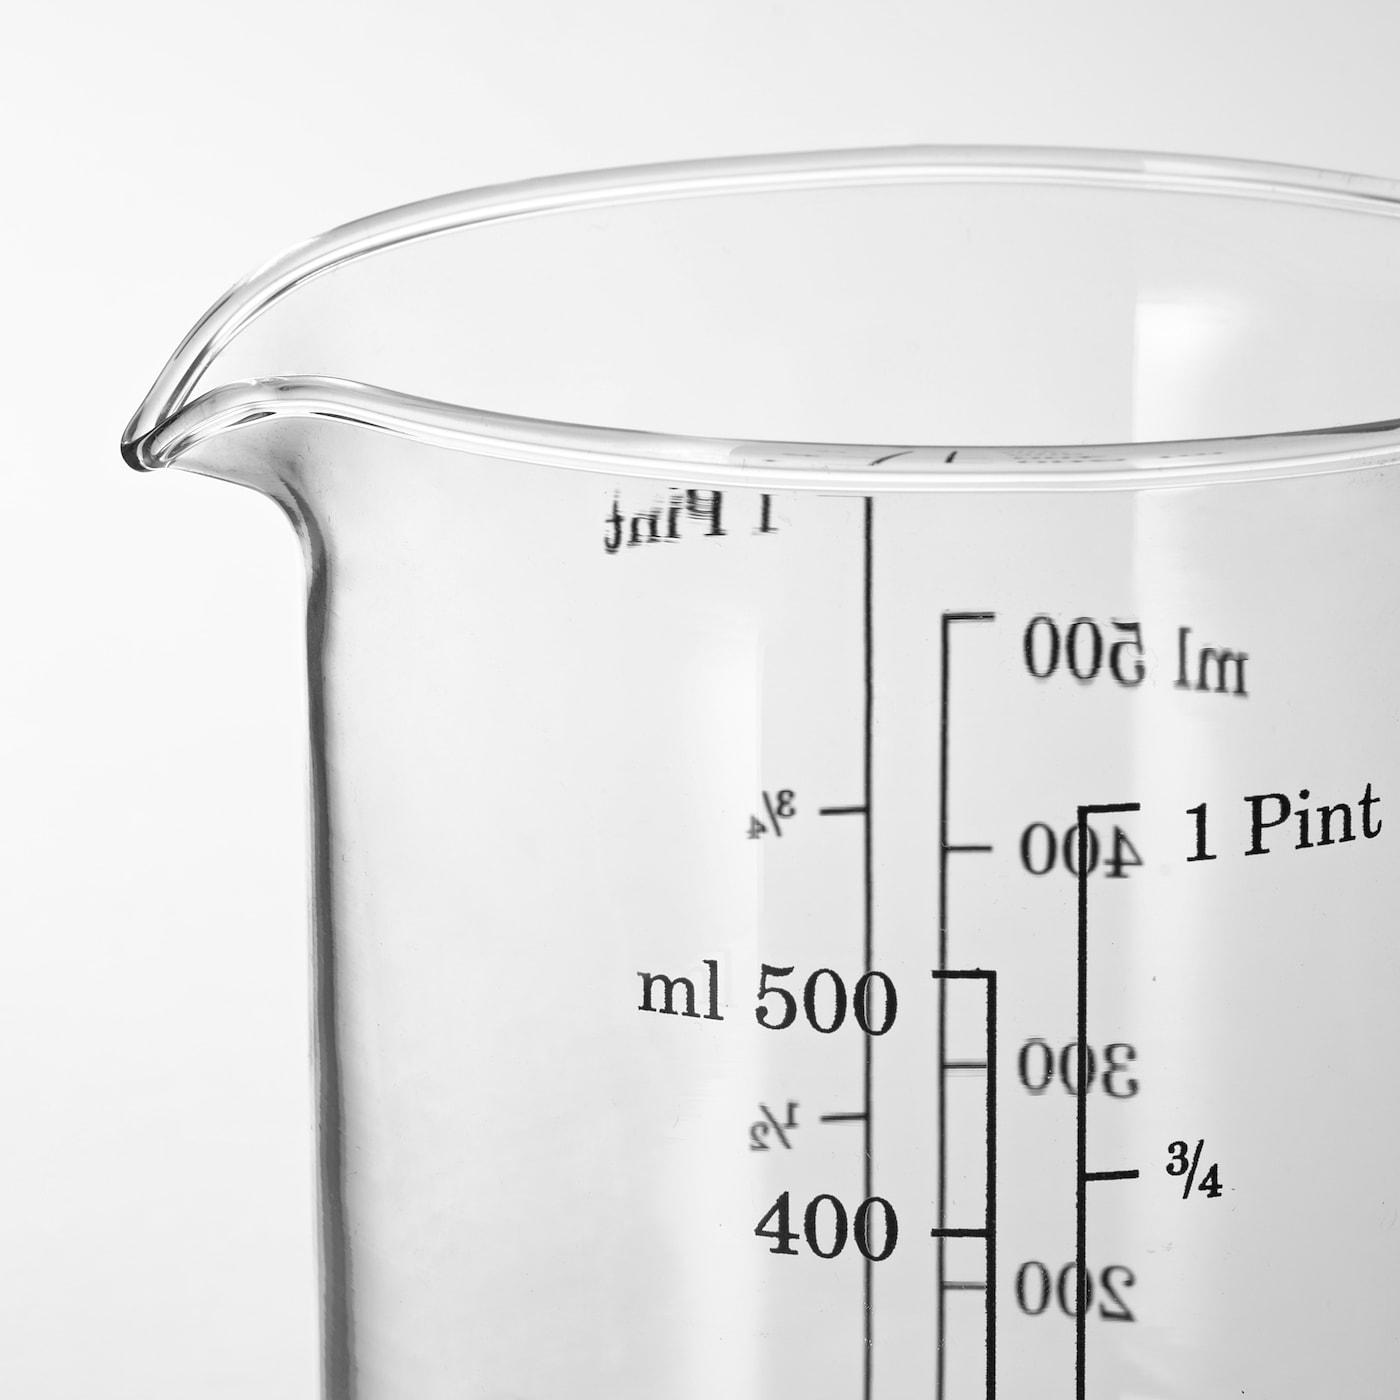 VARDAGEN 바르다겐 계량컵, 유리, 0.5 l